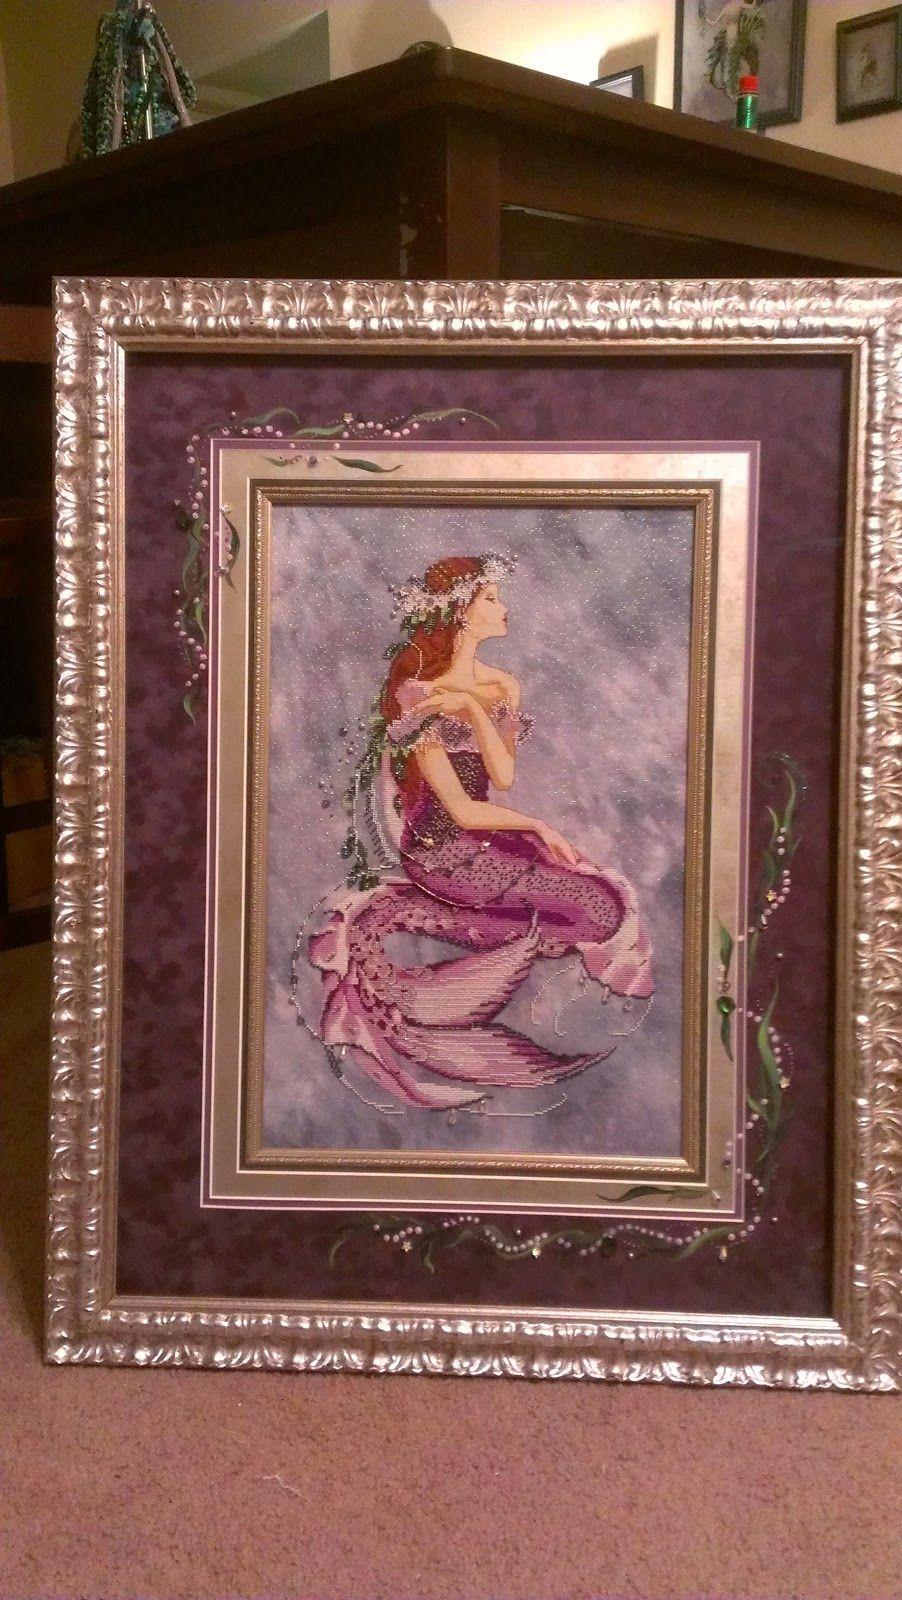 Enchanted mermaid by mirabilia designs on 32 ct moonlit waters enchanted mermaid by mirabilia designs on 32 ct moonlit waters opalescent belfast by under the sea jeuxipadfo Choice Image